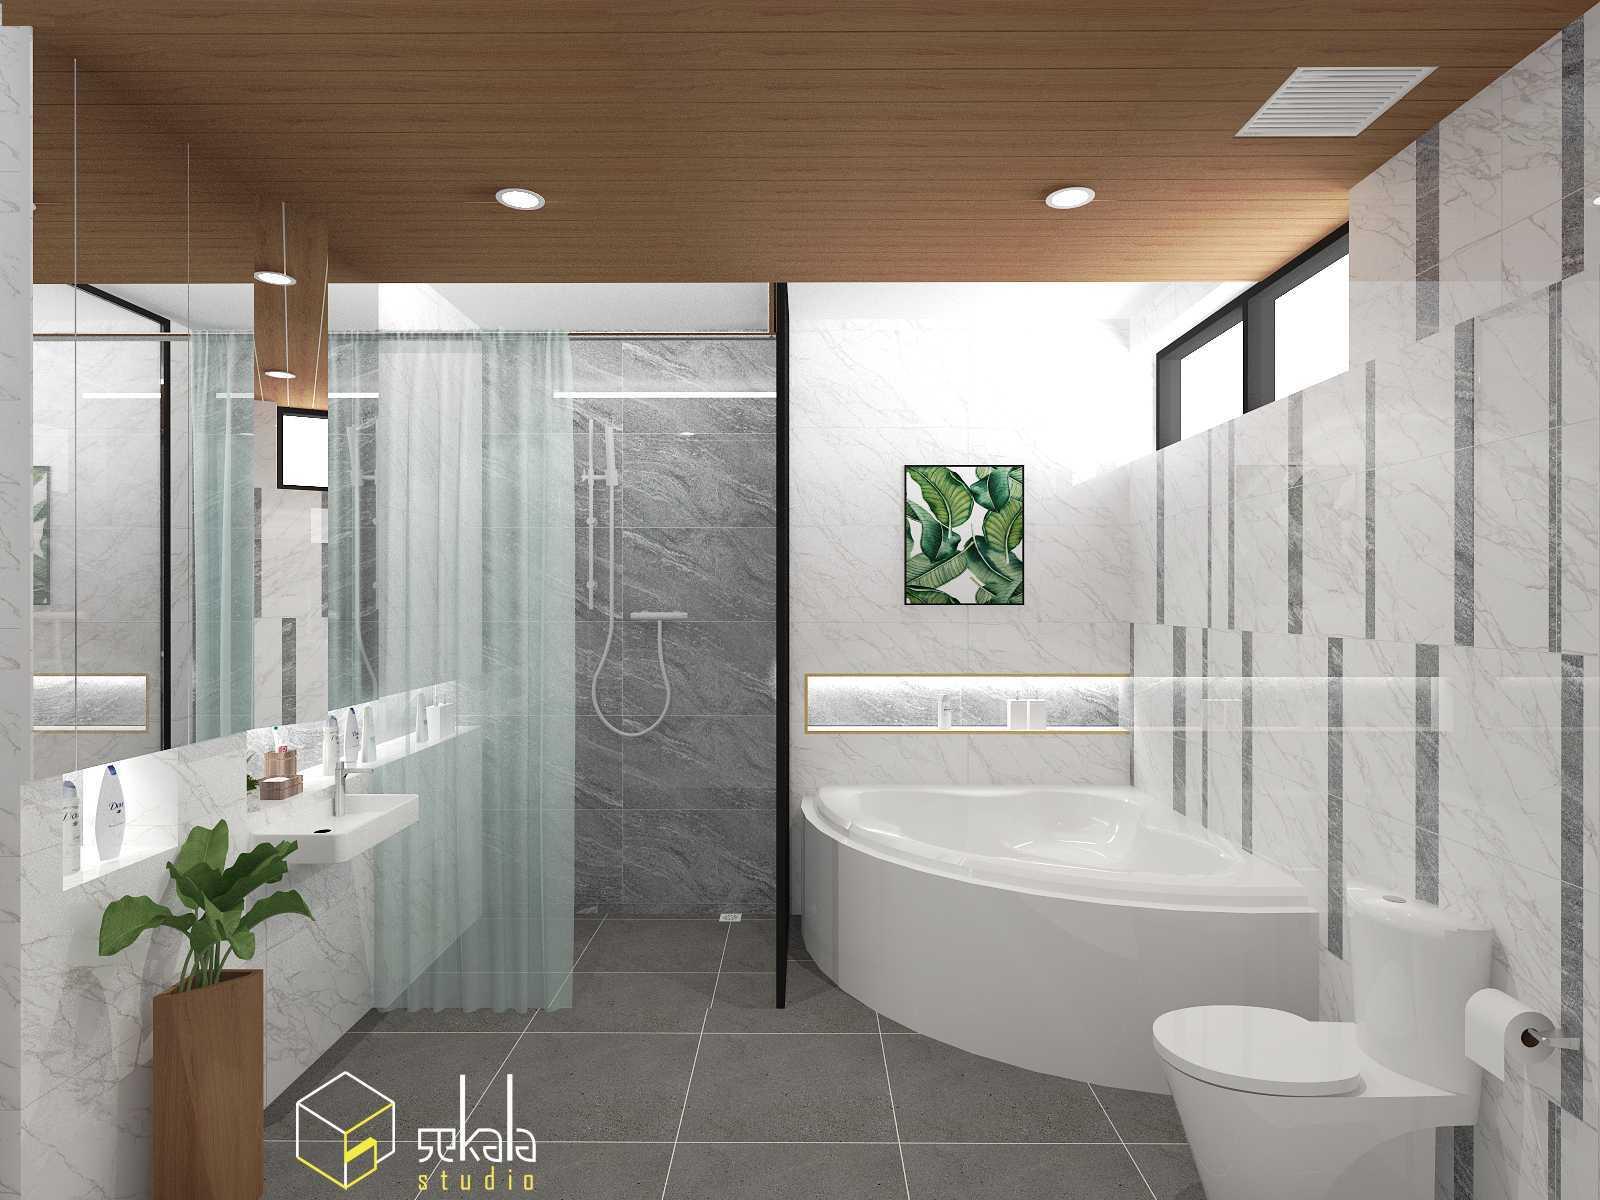 Sekala Mr. Adrian's Bathroom Banyuasin I, Kabupaten Banyu Asin, Sumatera Selatan, Indonesia Banyuasin I, Kabupaten Banyu Asin, Sumatera Selatan, Indonesia Sekala-Mr-Adrians-Bathroom  55252